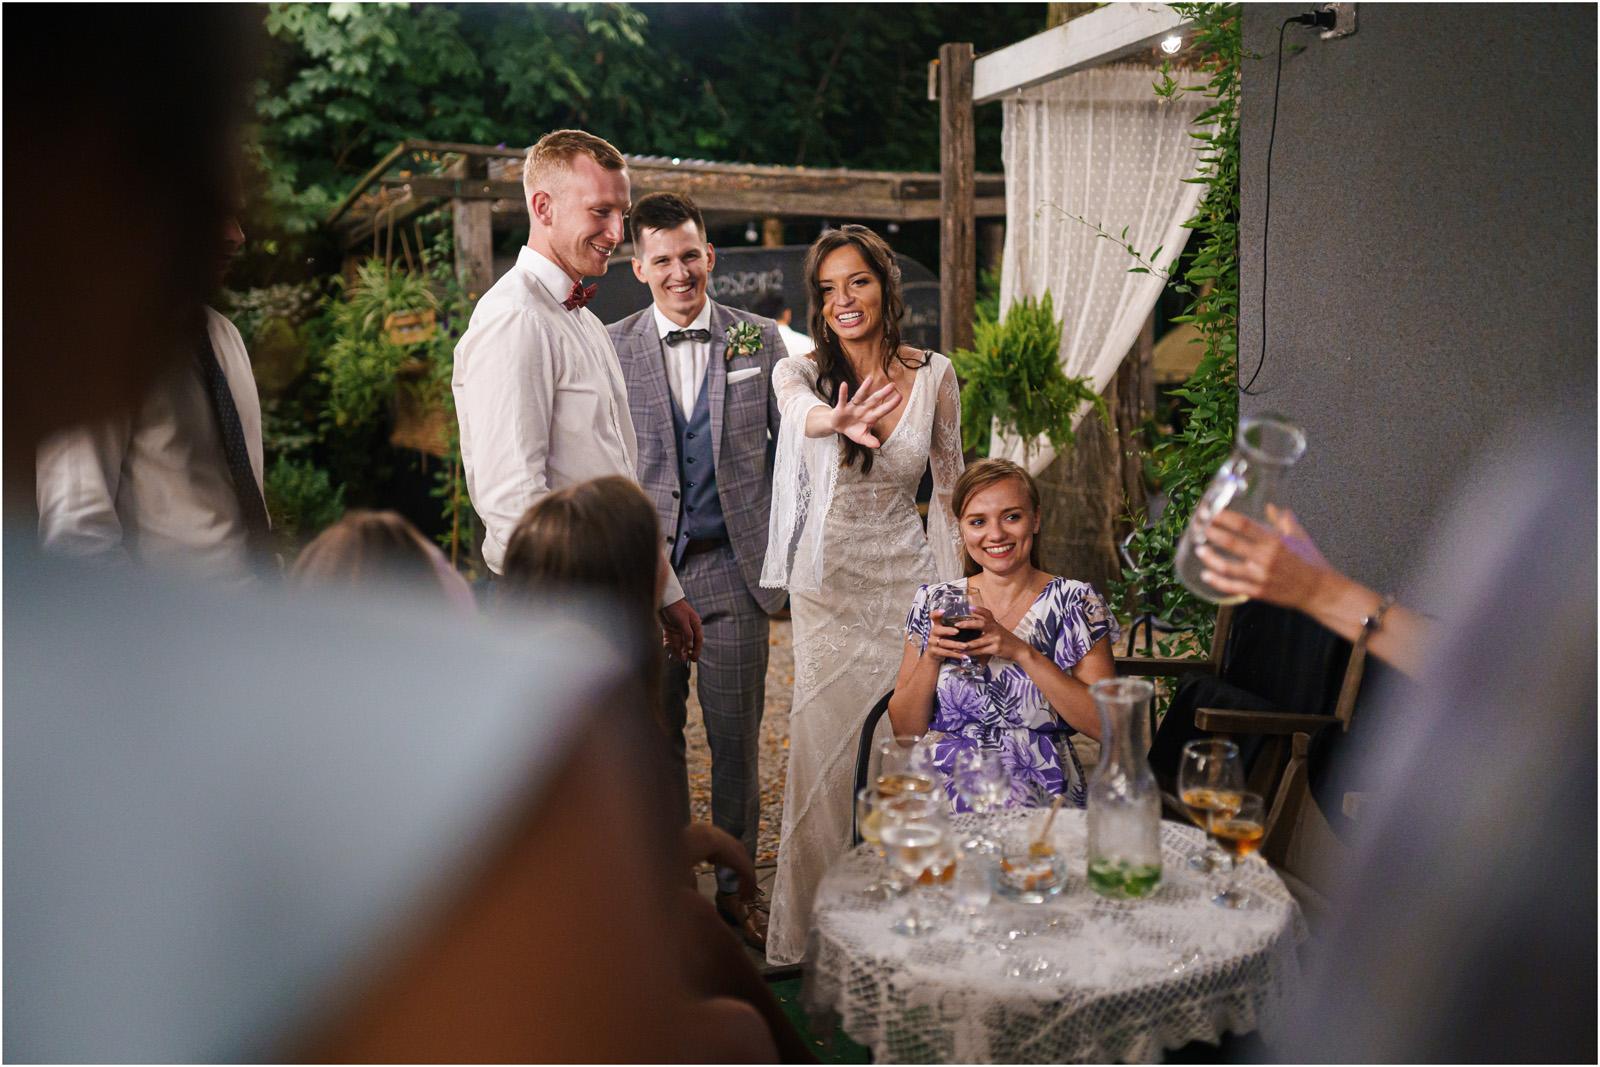 Ania & Mateusz | boho wesele w Stodole pod Kasztanami 129